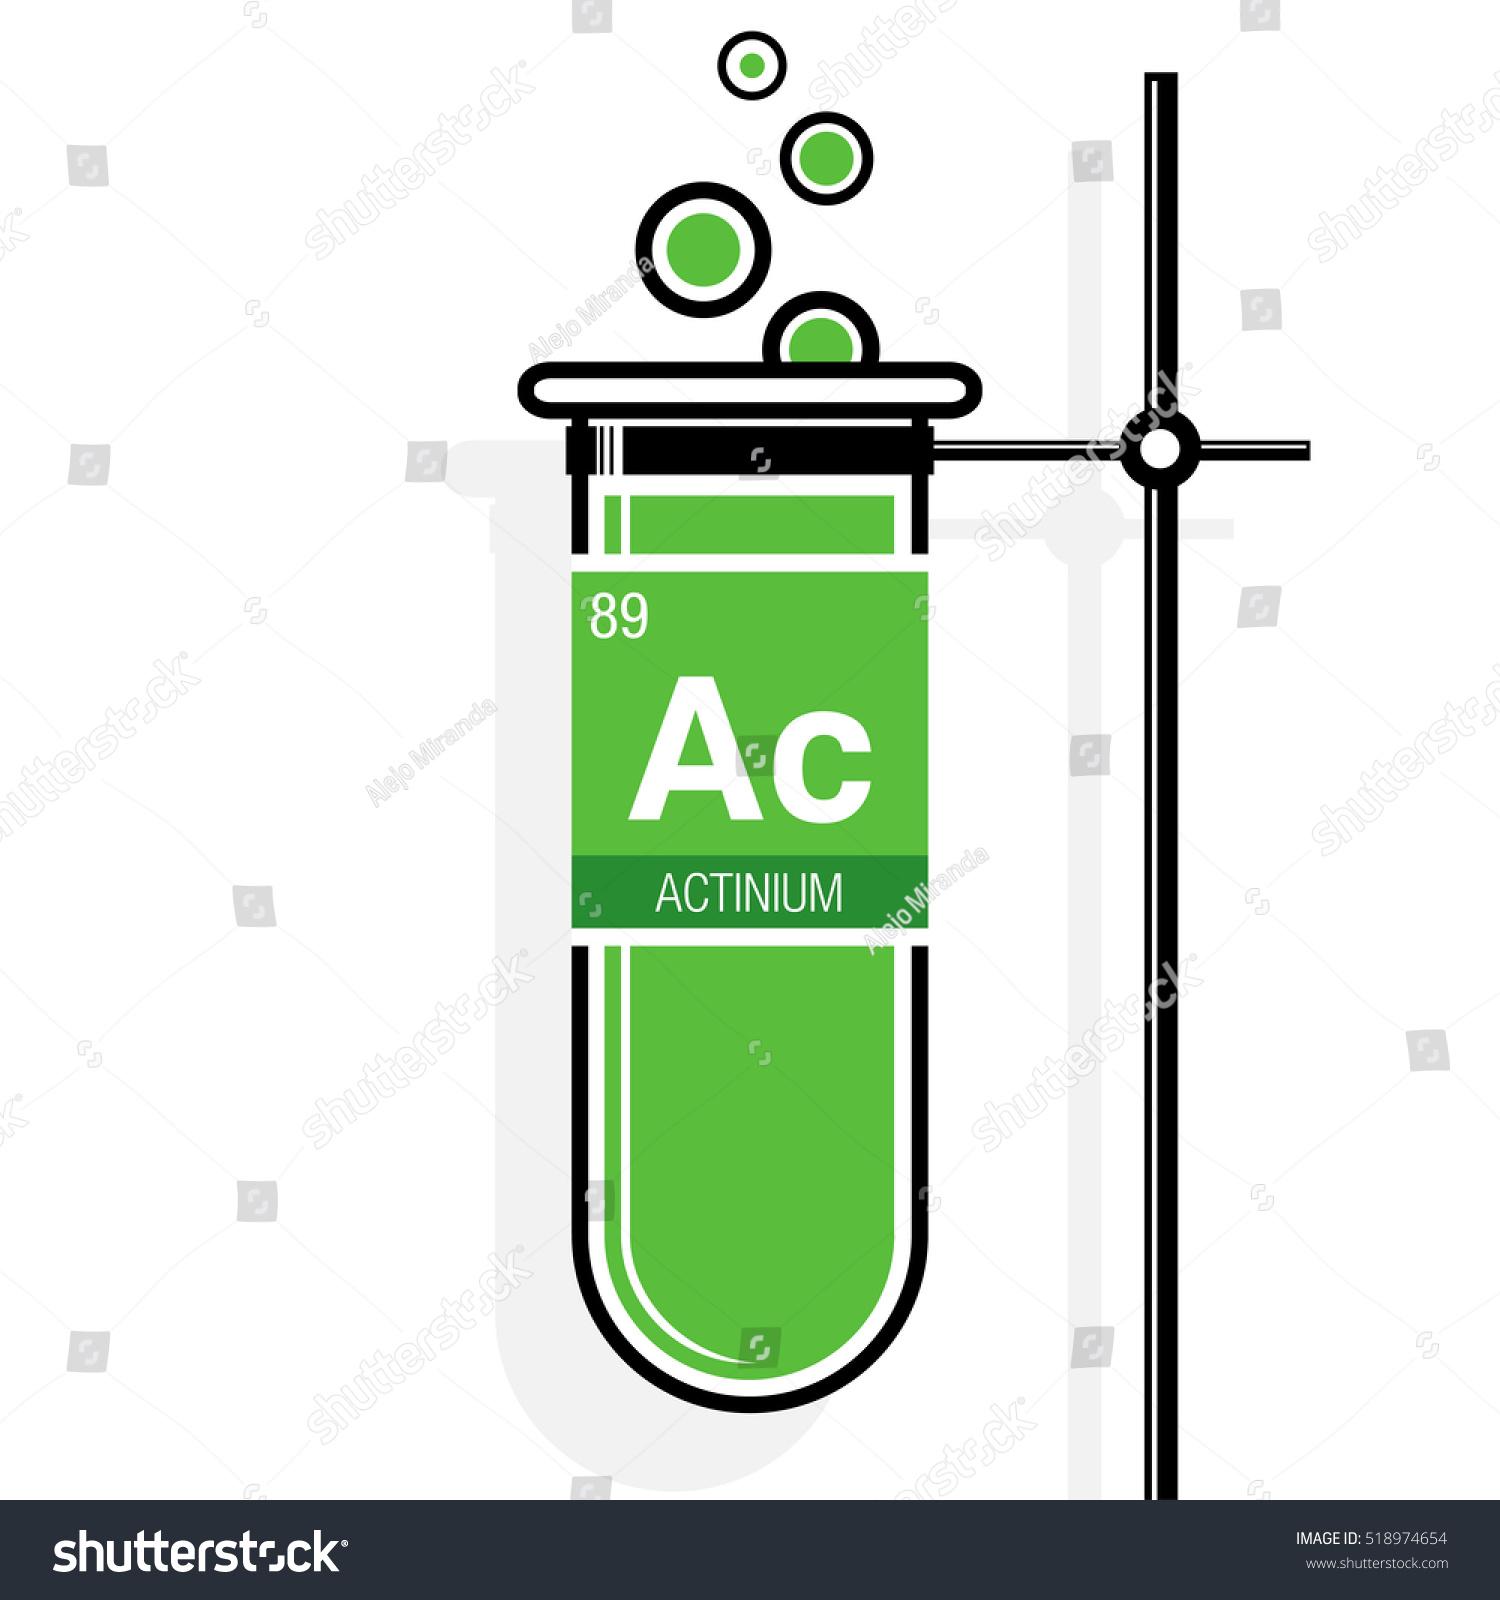 Actinium Symbol On Label Green Test Stock Vector 518974654